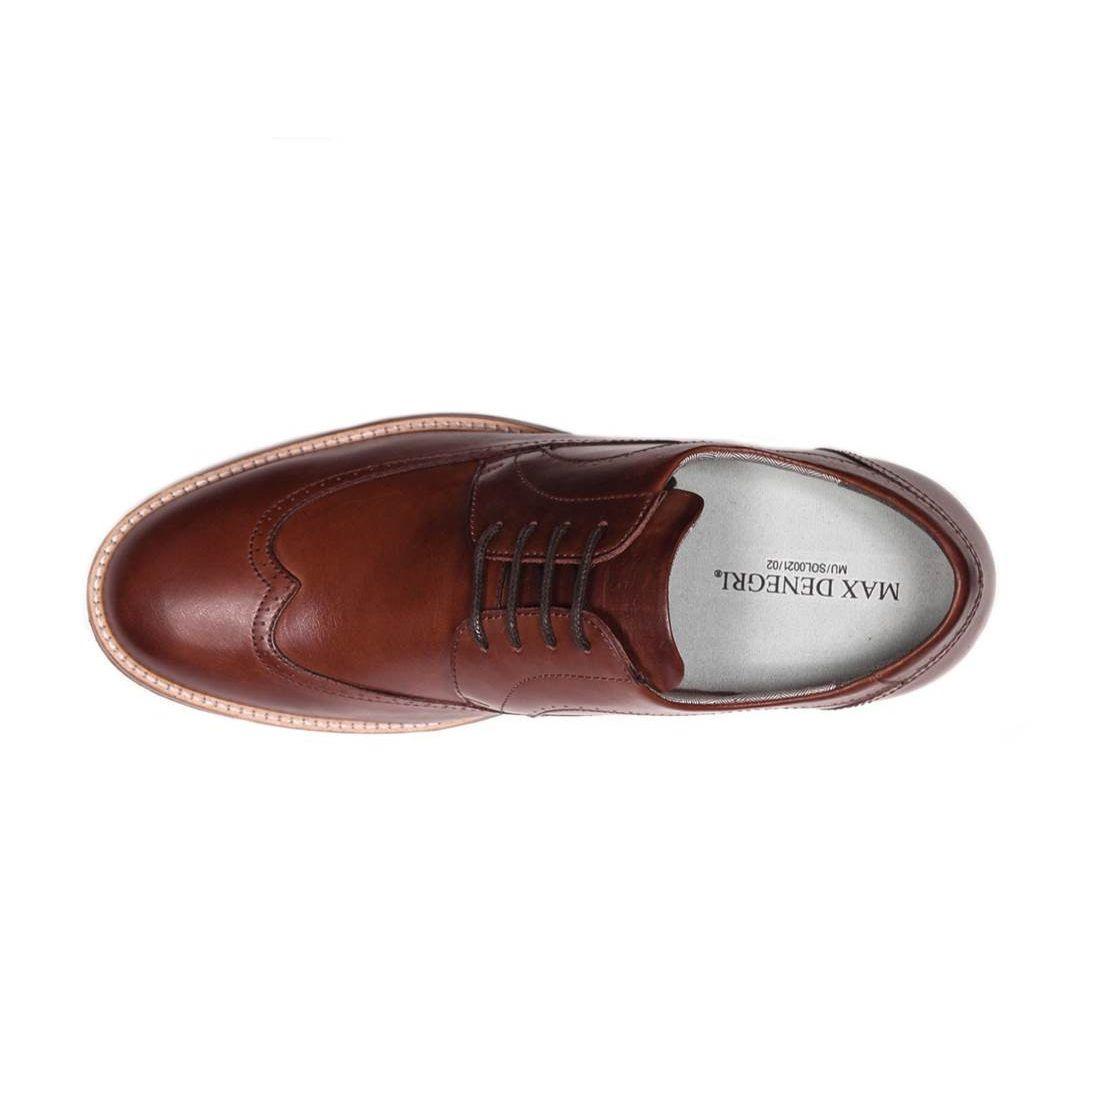 Zapato Casual Oxford Café Oscuro Max Denegri +7cm de Altura_71060